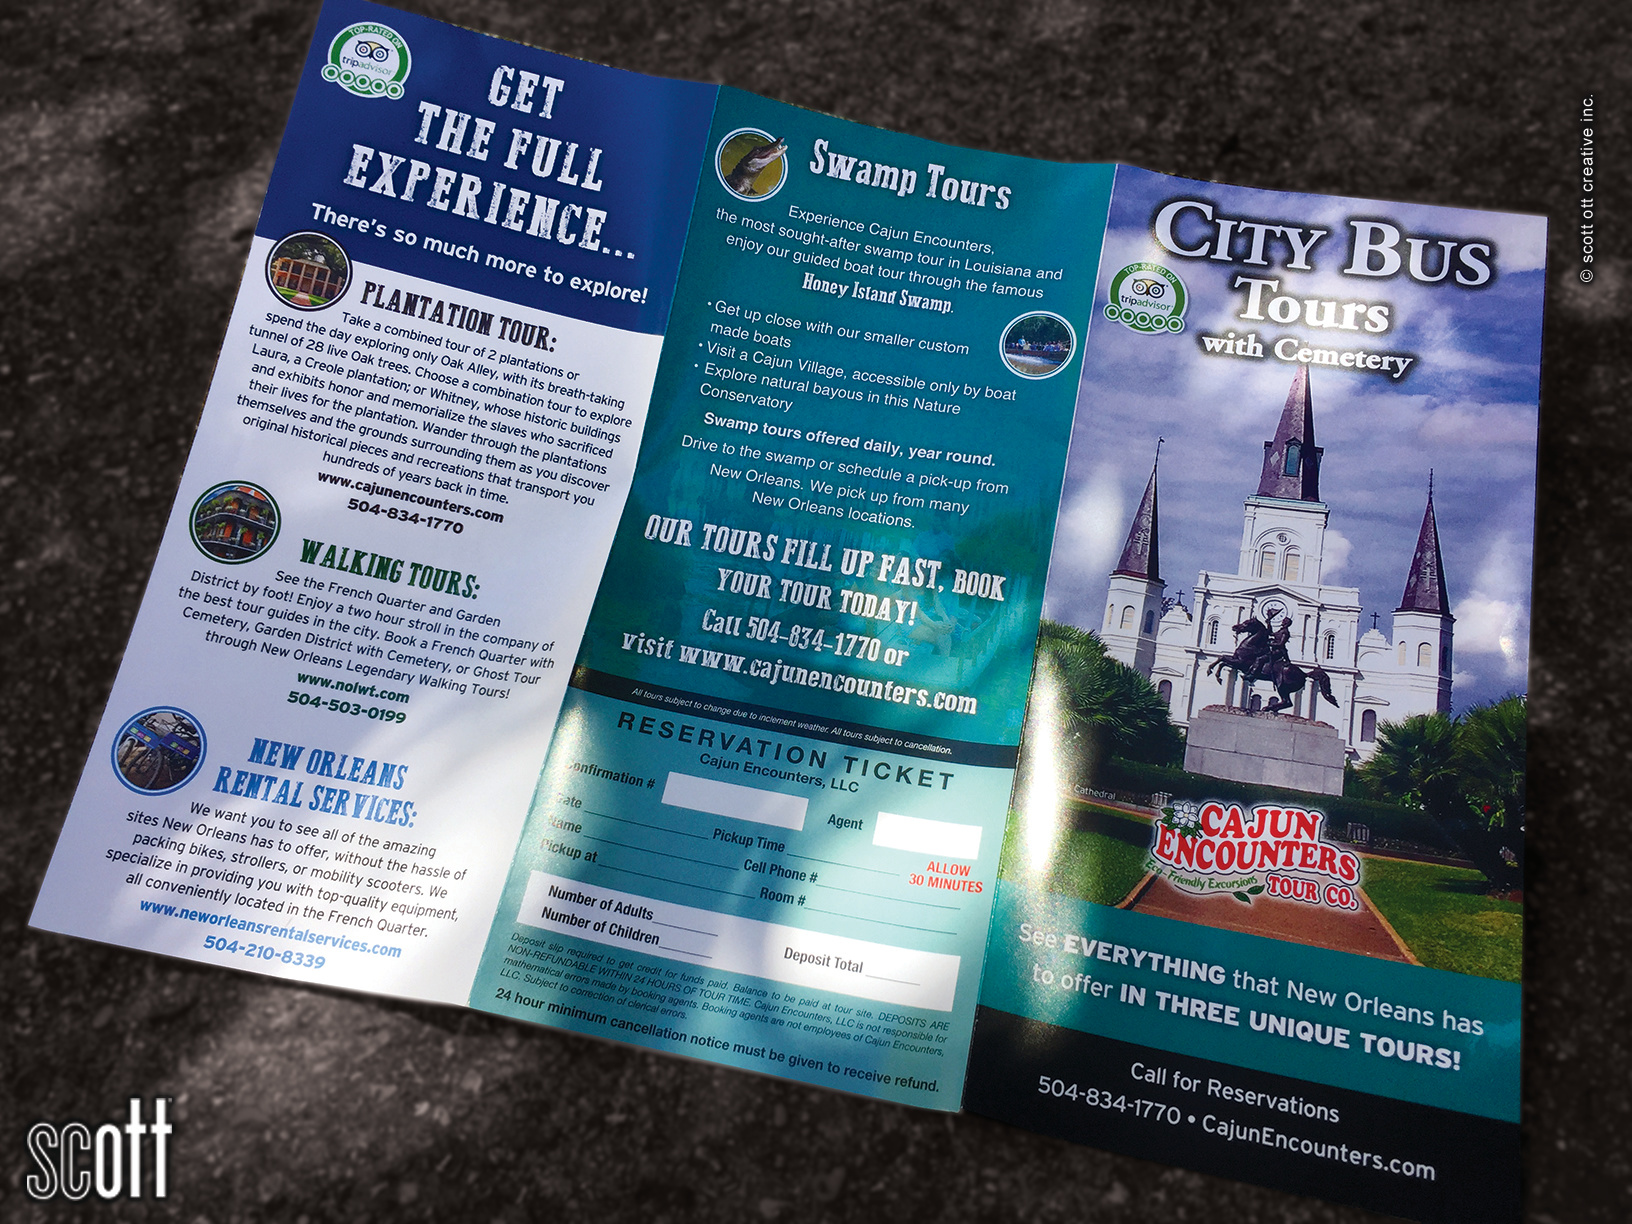 Cajun Encounters CITY TOUR bsck - scott ott creative inc